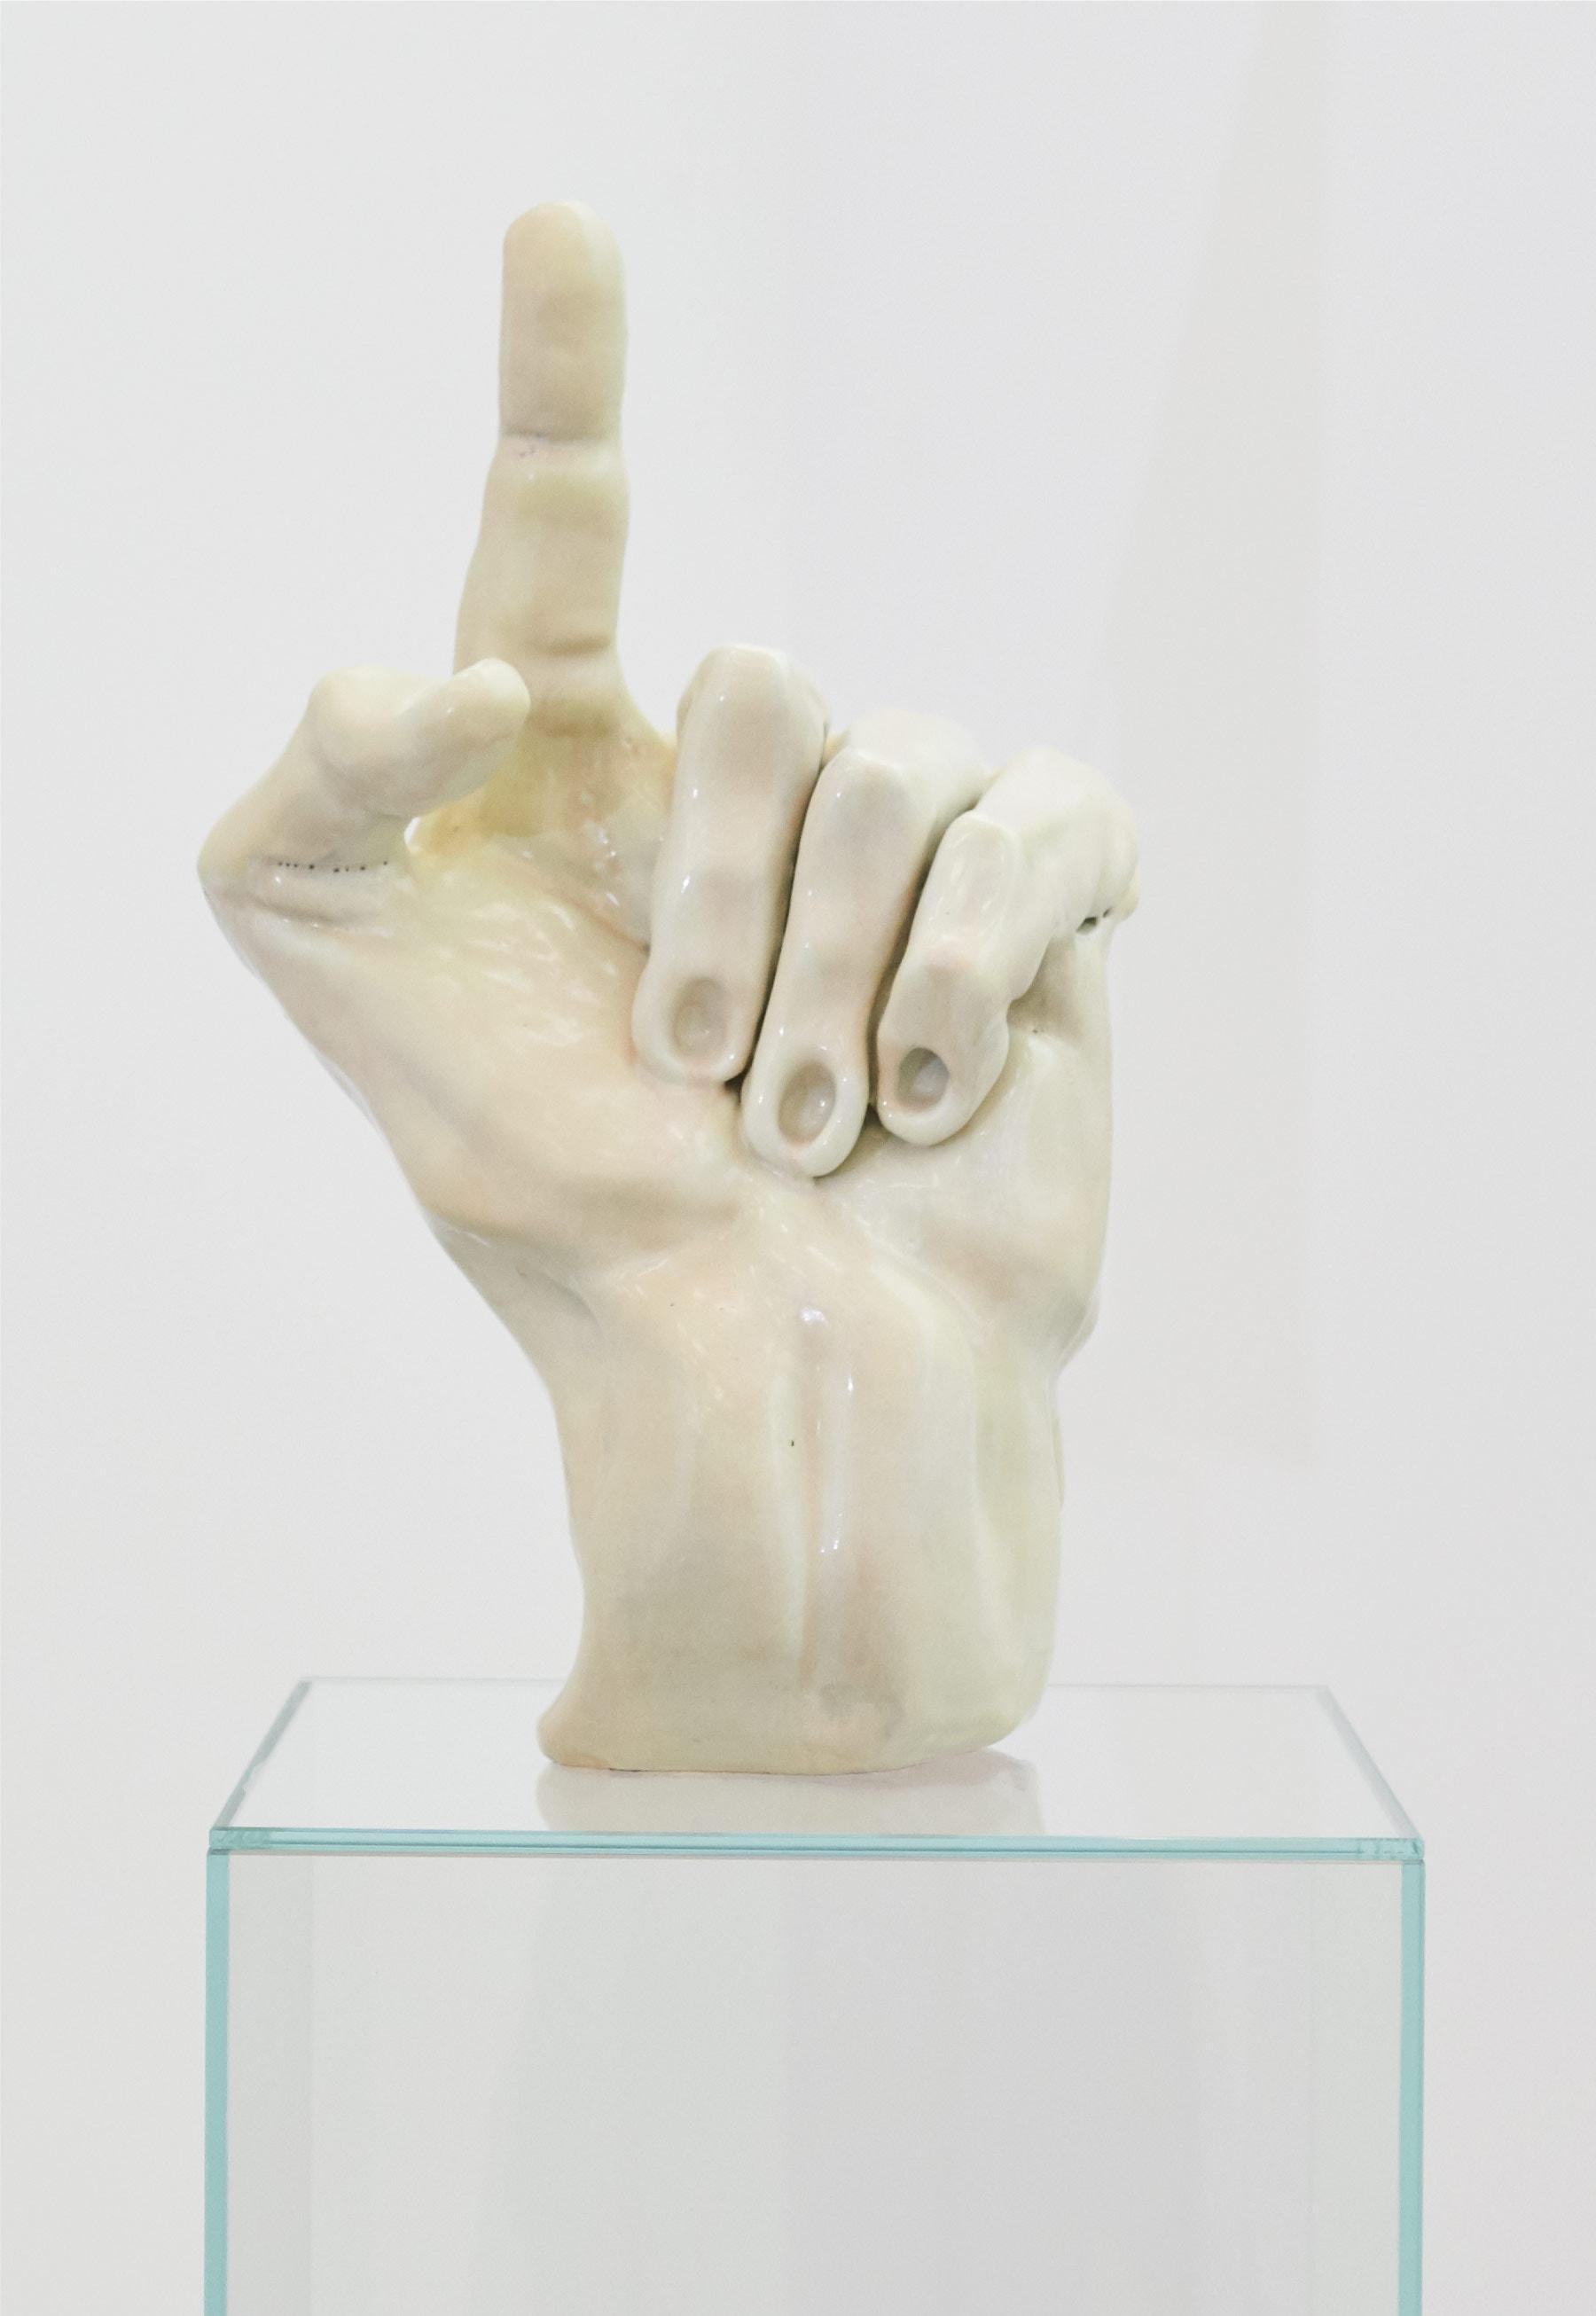 Artwork:Nicolás Guagnini, Asociación Psicoanalítica Argentina, 2019, installation view, Bortolami, New York